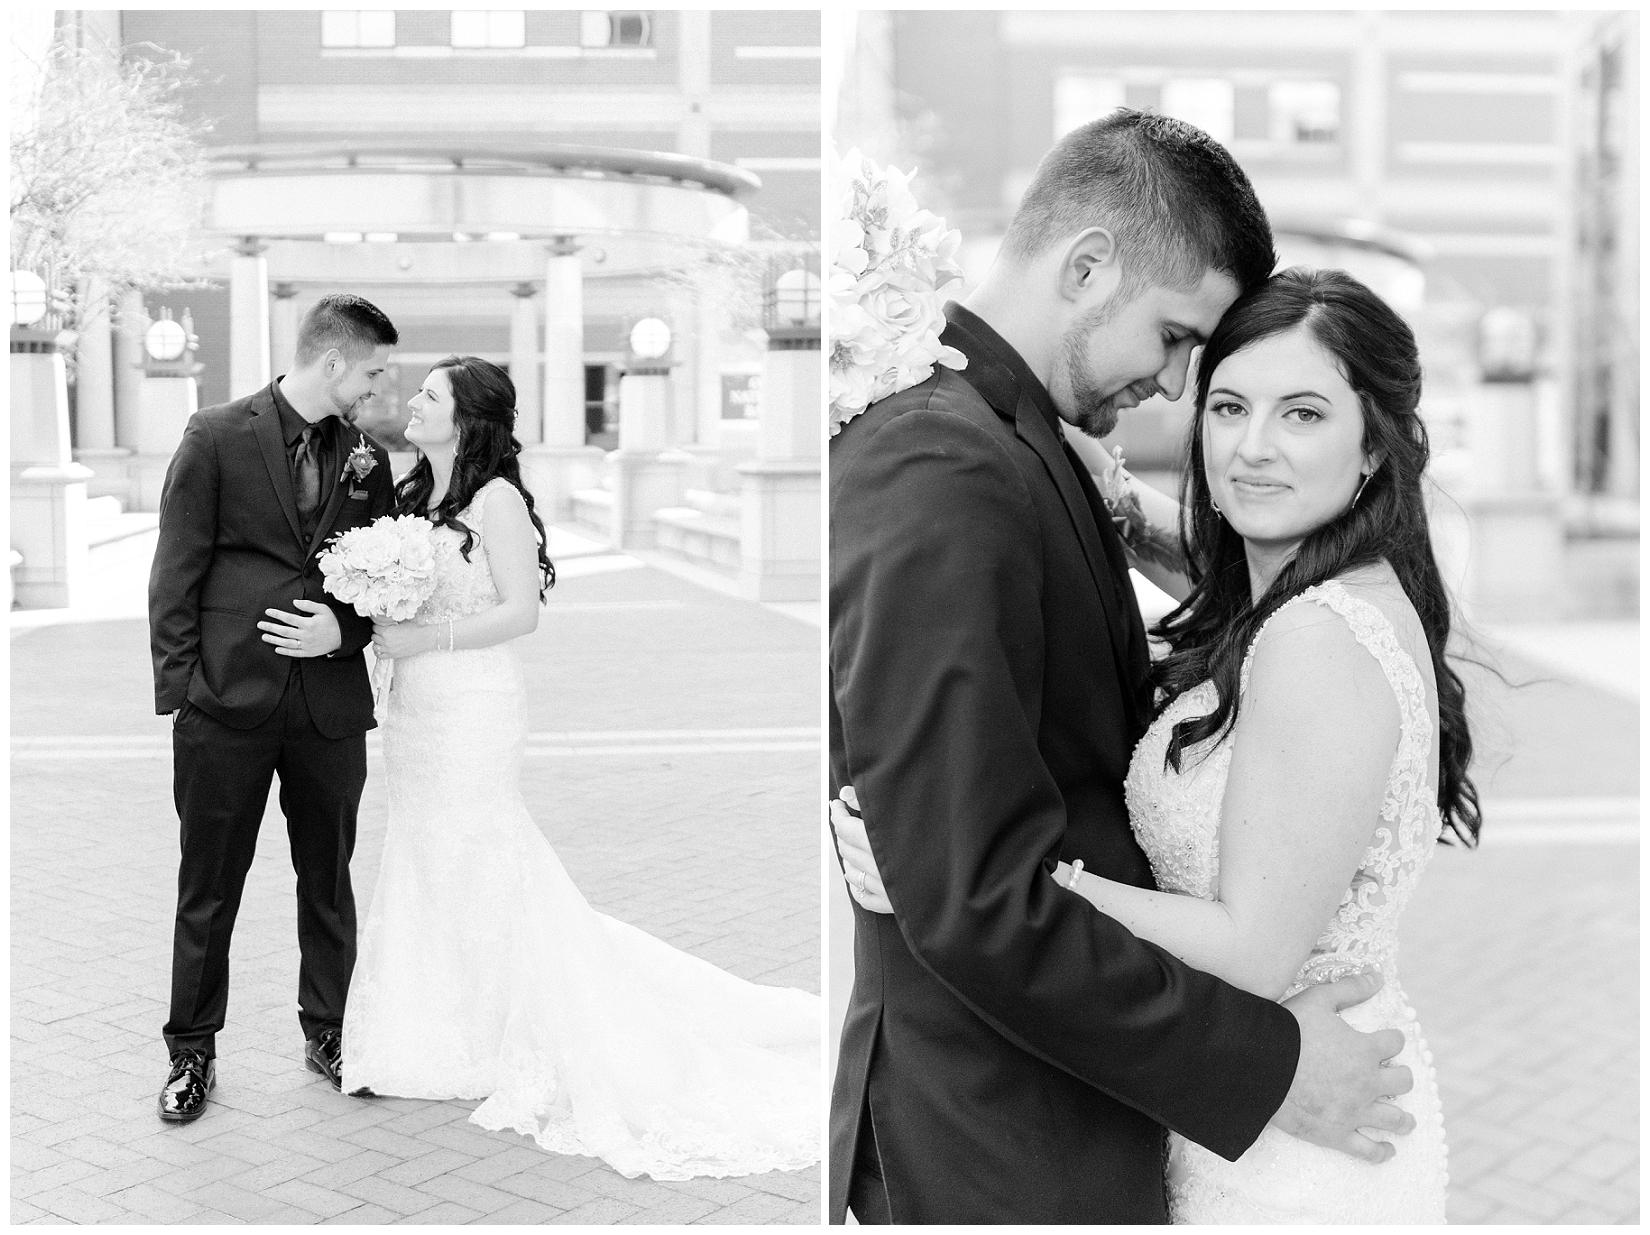 cat-alkire-wedding-photographer-indiana-chicago-indianapolis-fort-wayne_1107.jpg